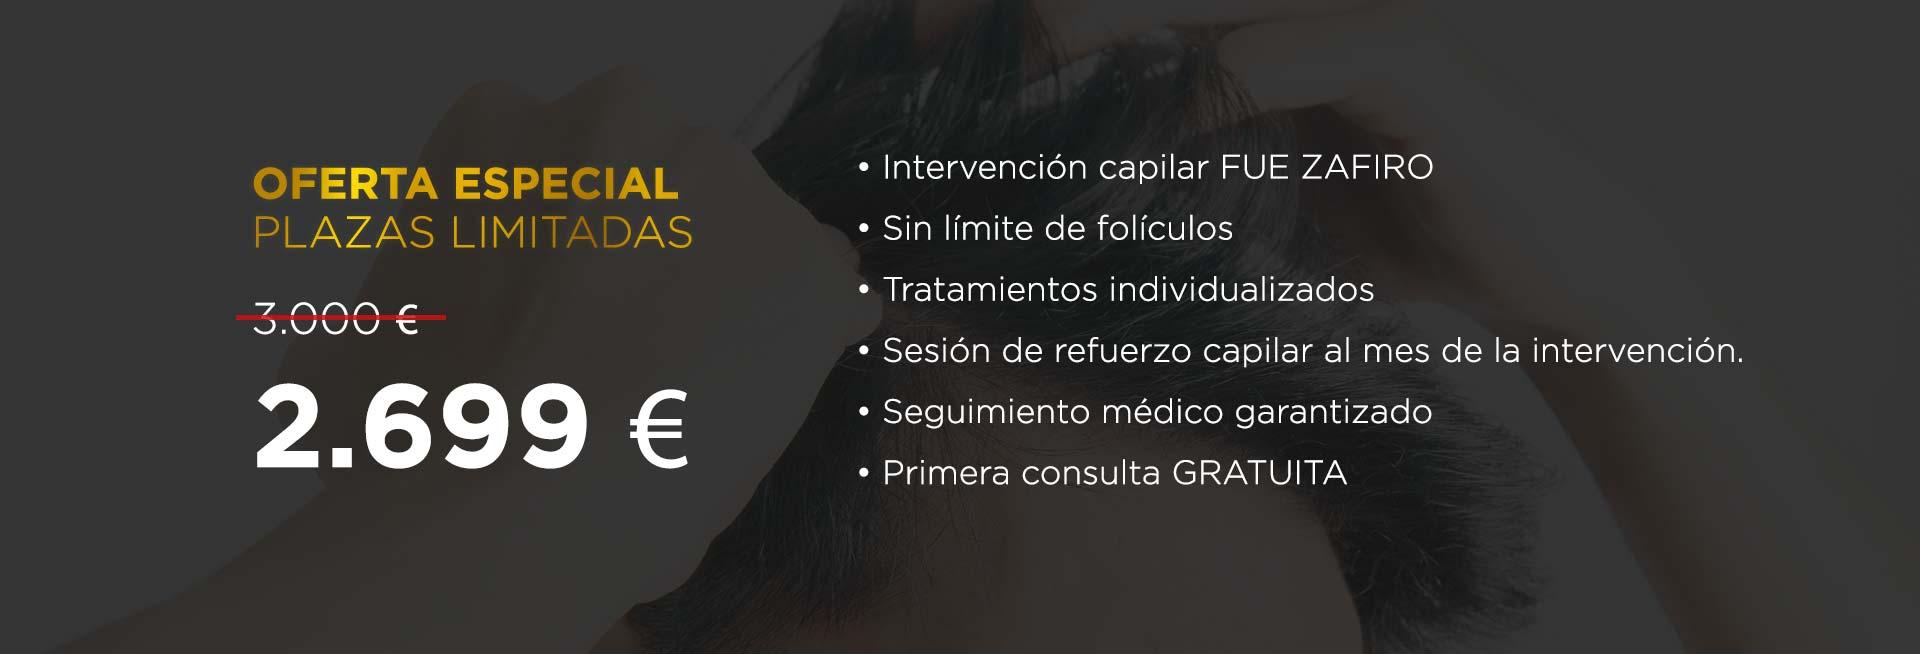 Élite Medical Madrid Oferta FUE Zafiro